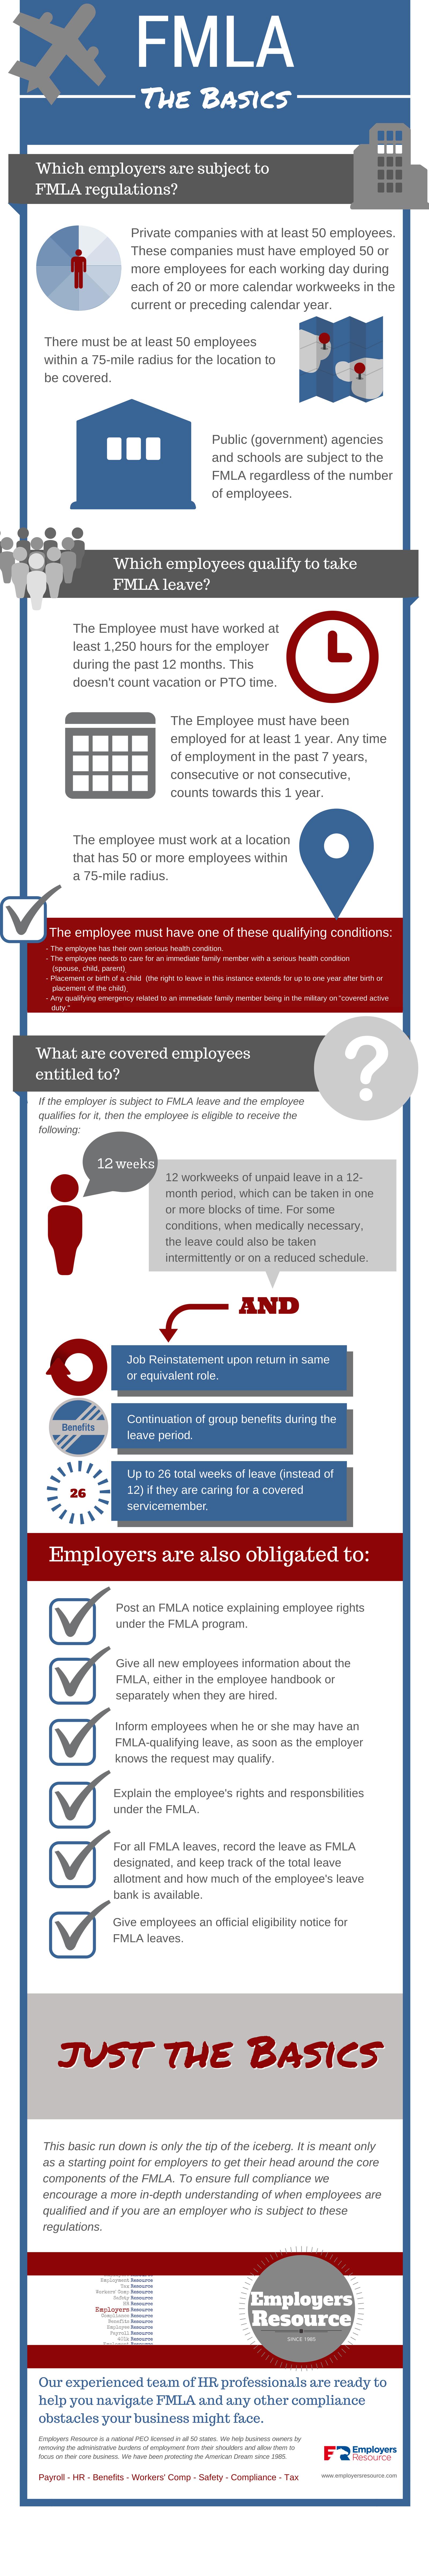 FMLA Basics for Employers Infographic